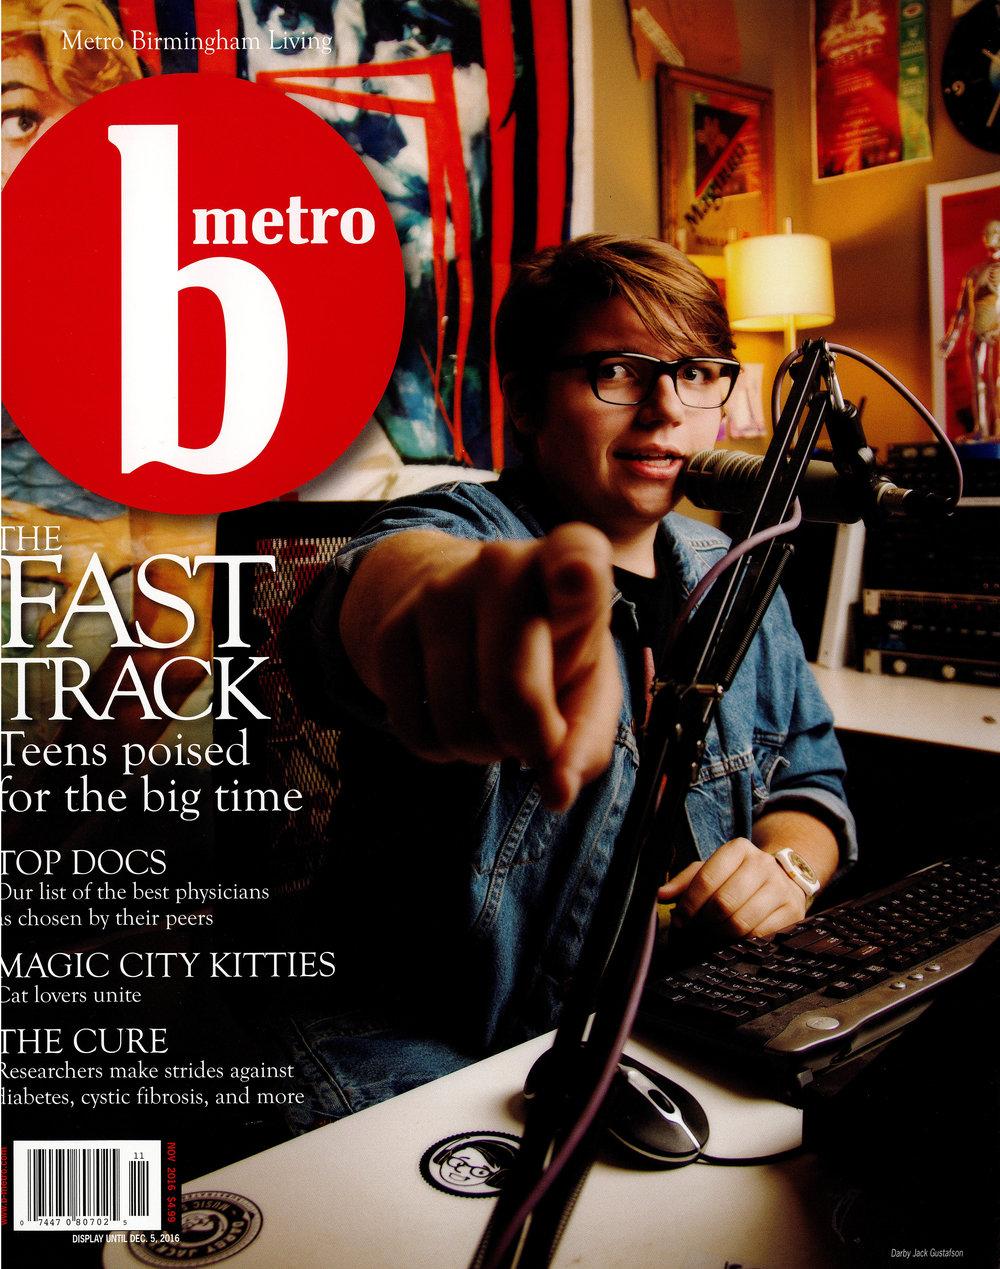 B-metro Magazine 2016 7 sticks lake house cover page architecture exterior and interior design Alabama